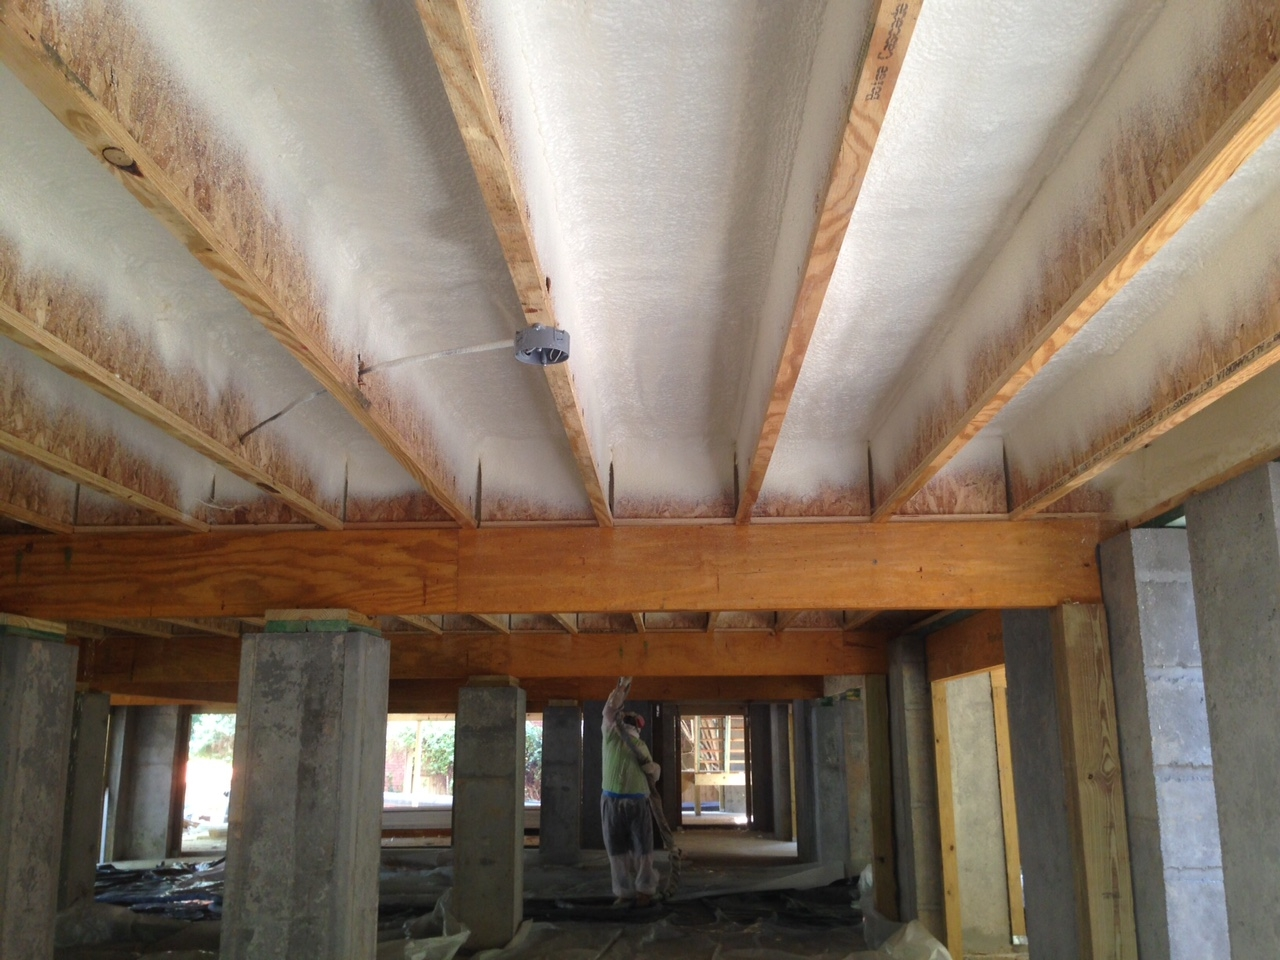 Spray Insulation For Basement Ceiling